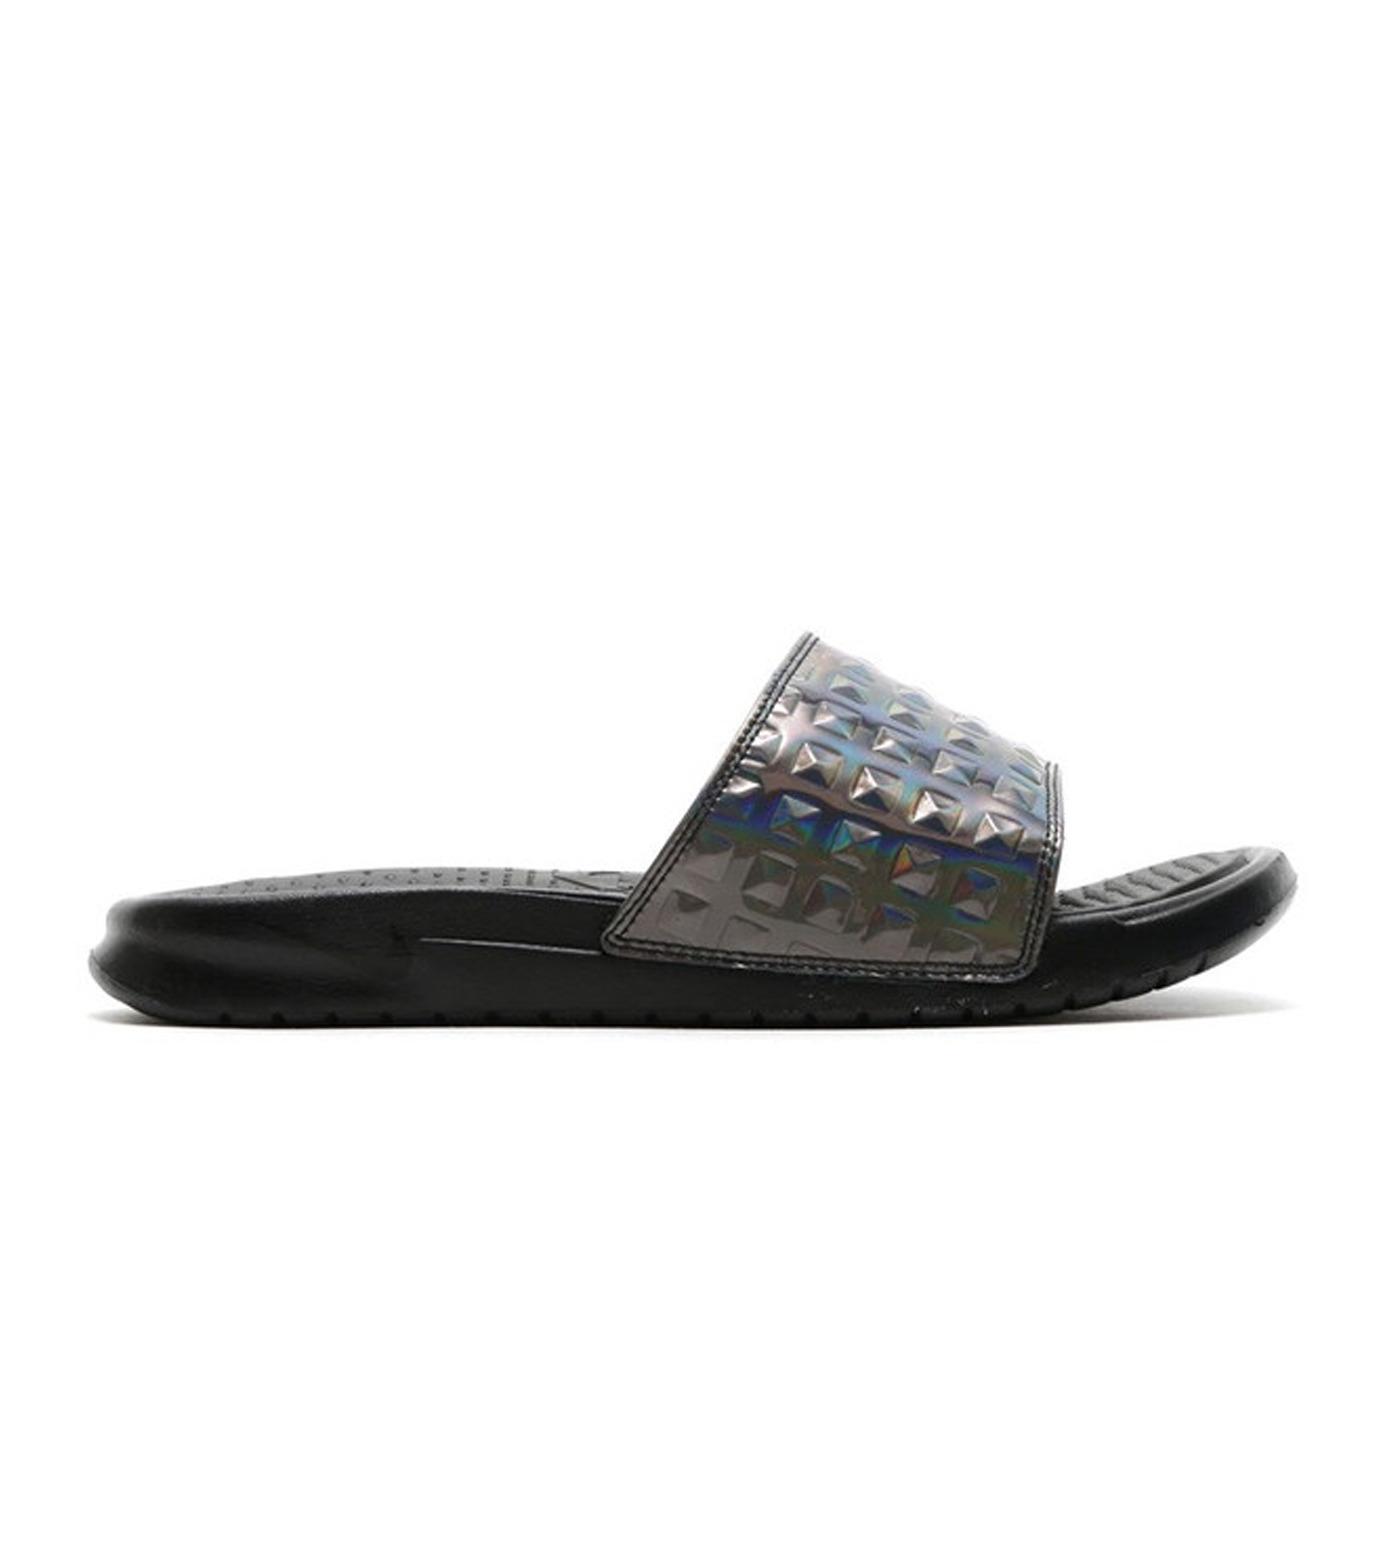 NIKE(ナイキ)のBENASSI JDI-BLACK(シューズ/shoes)-818737-003-13 拡大詳細画像1